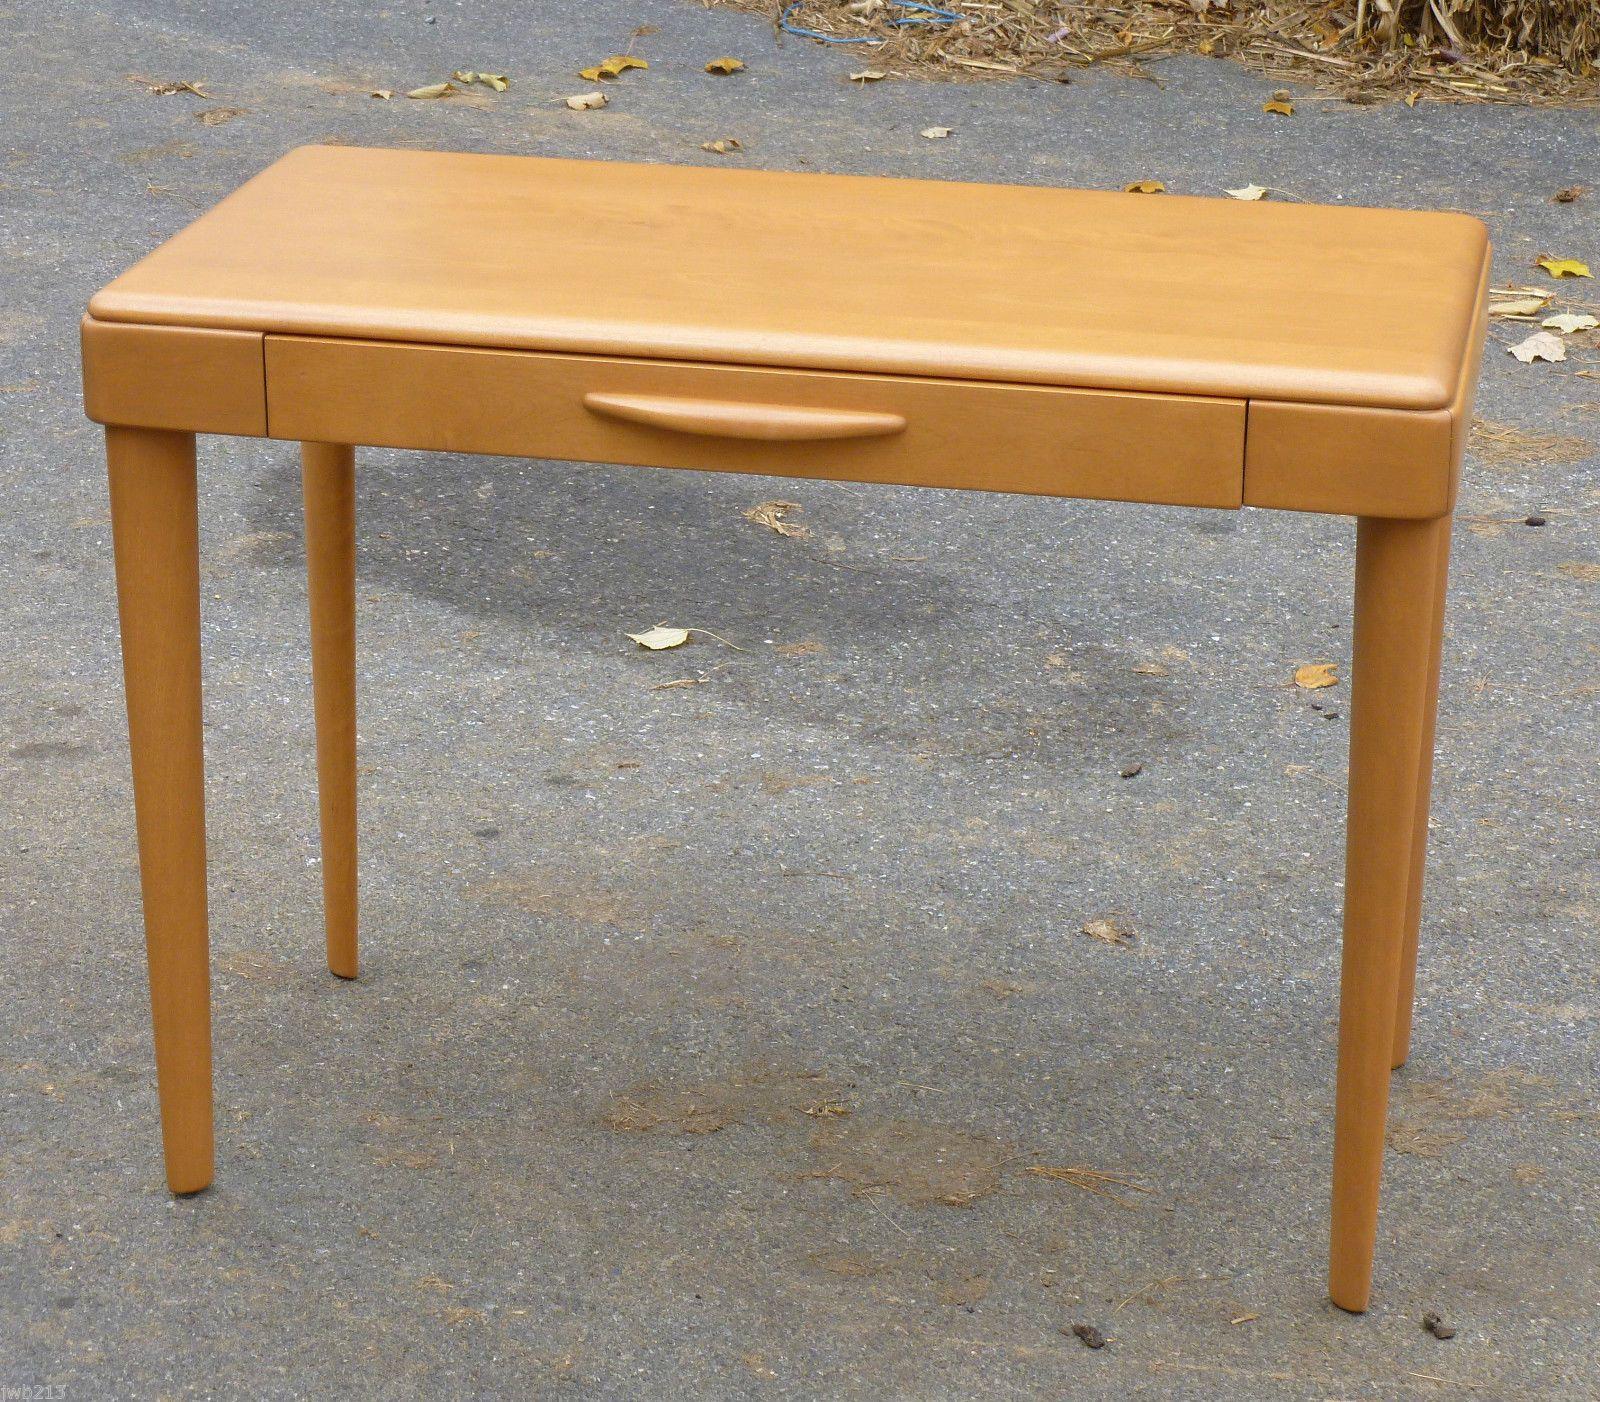 Sold in Nov 2013 for $500 RARE Heywood Wakefield Table Desk